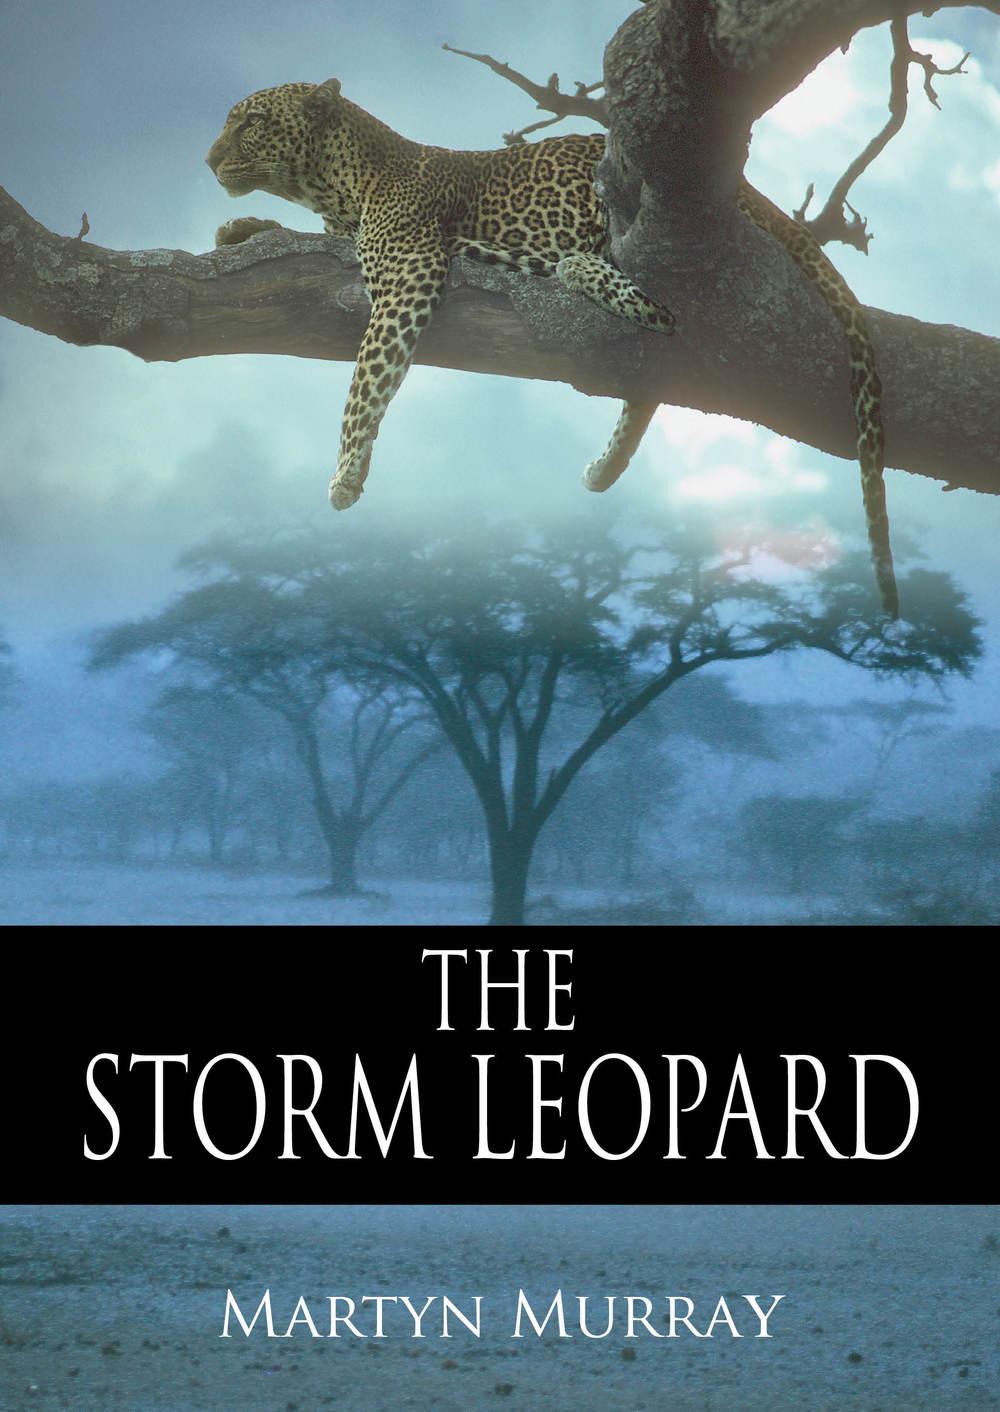 The Storm Leopard.jpg